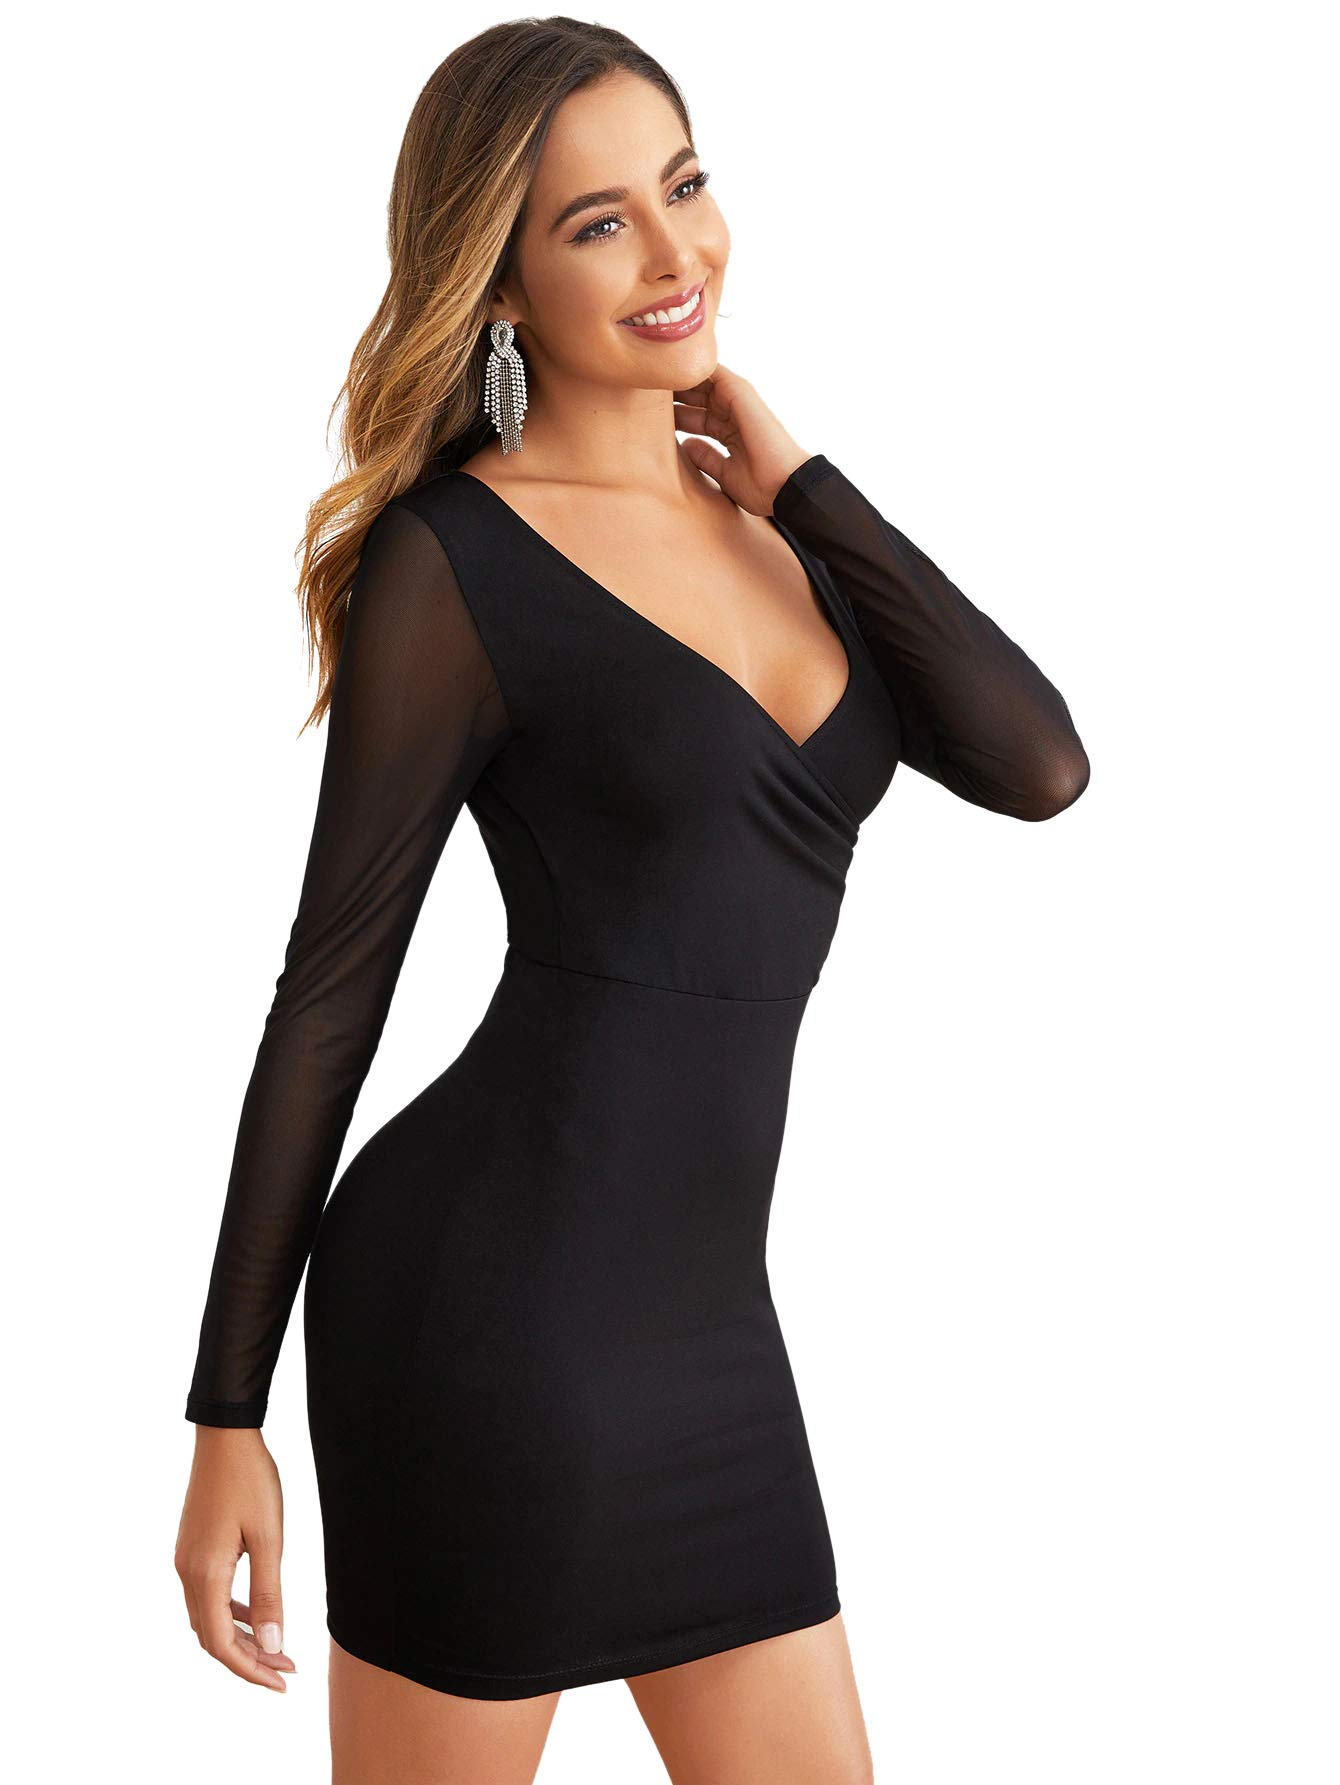 Romwe Women's Elegant V-Neck Mesh Long Sleeve Sexy Party Work Bodycon Wrap Pencil Dress